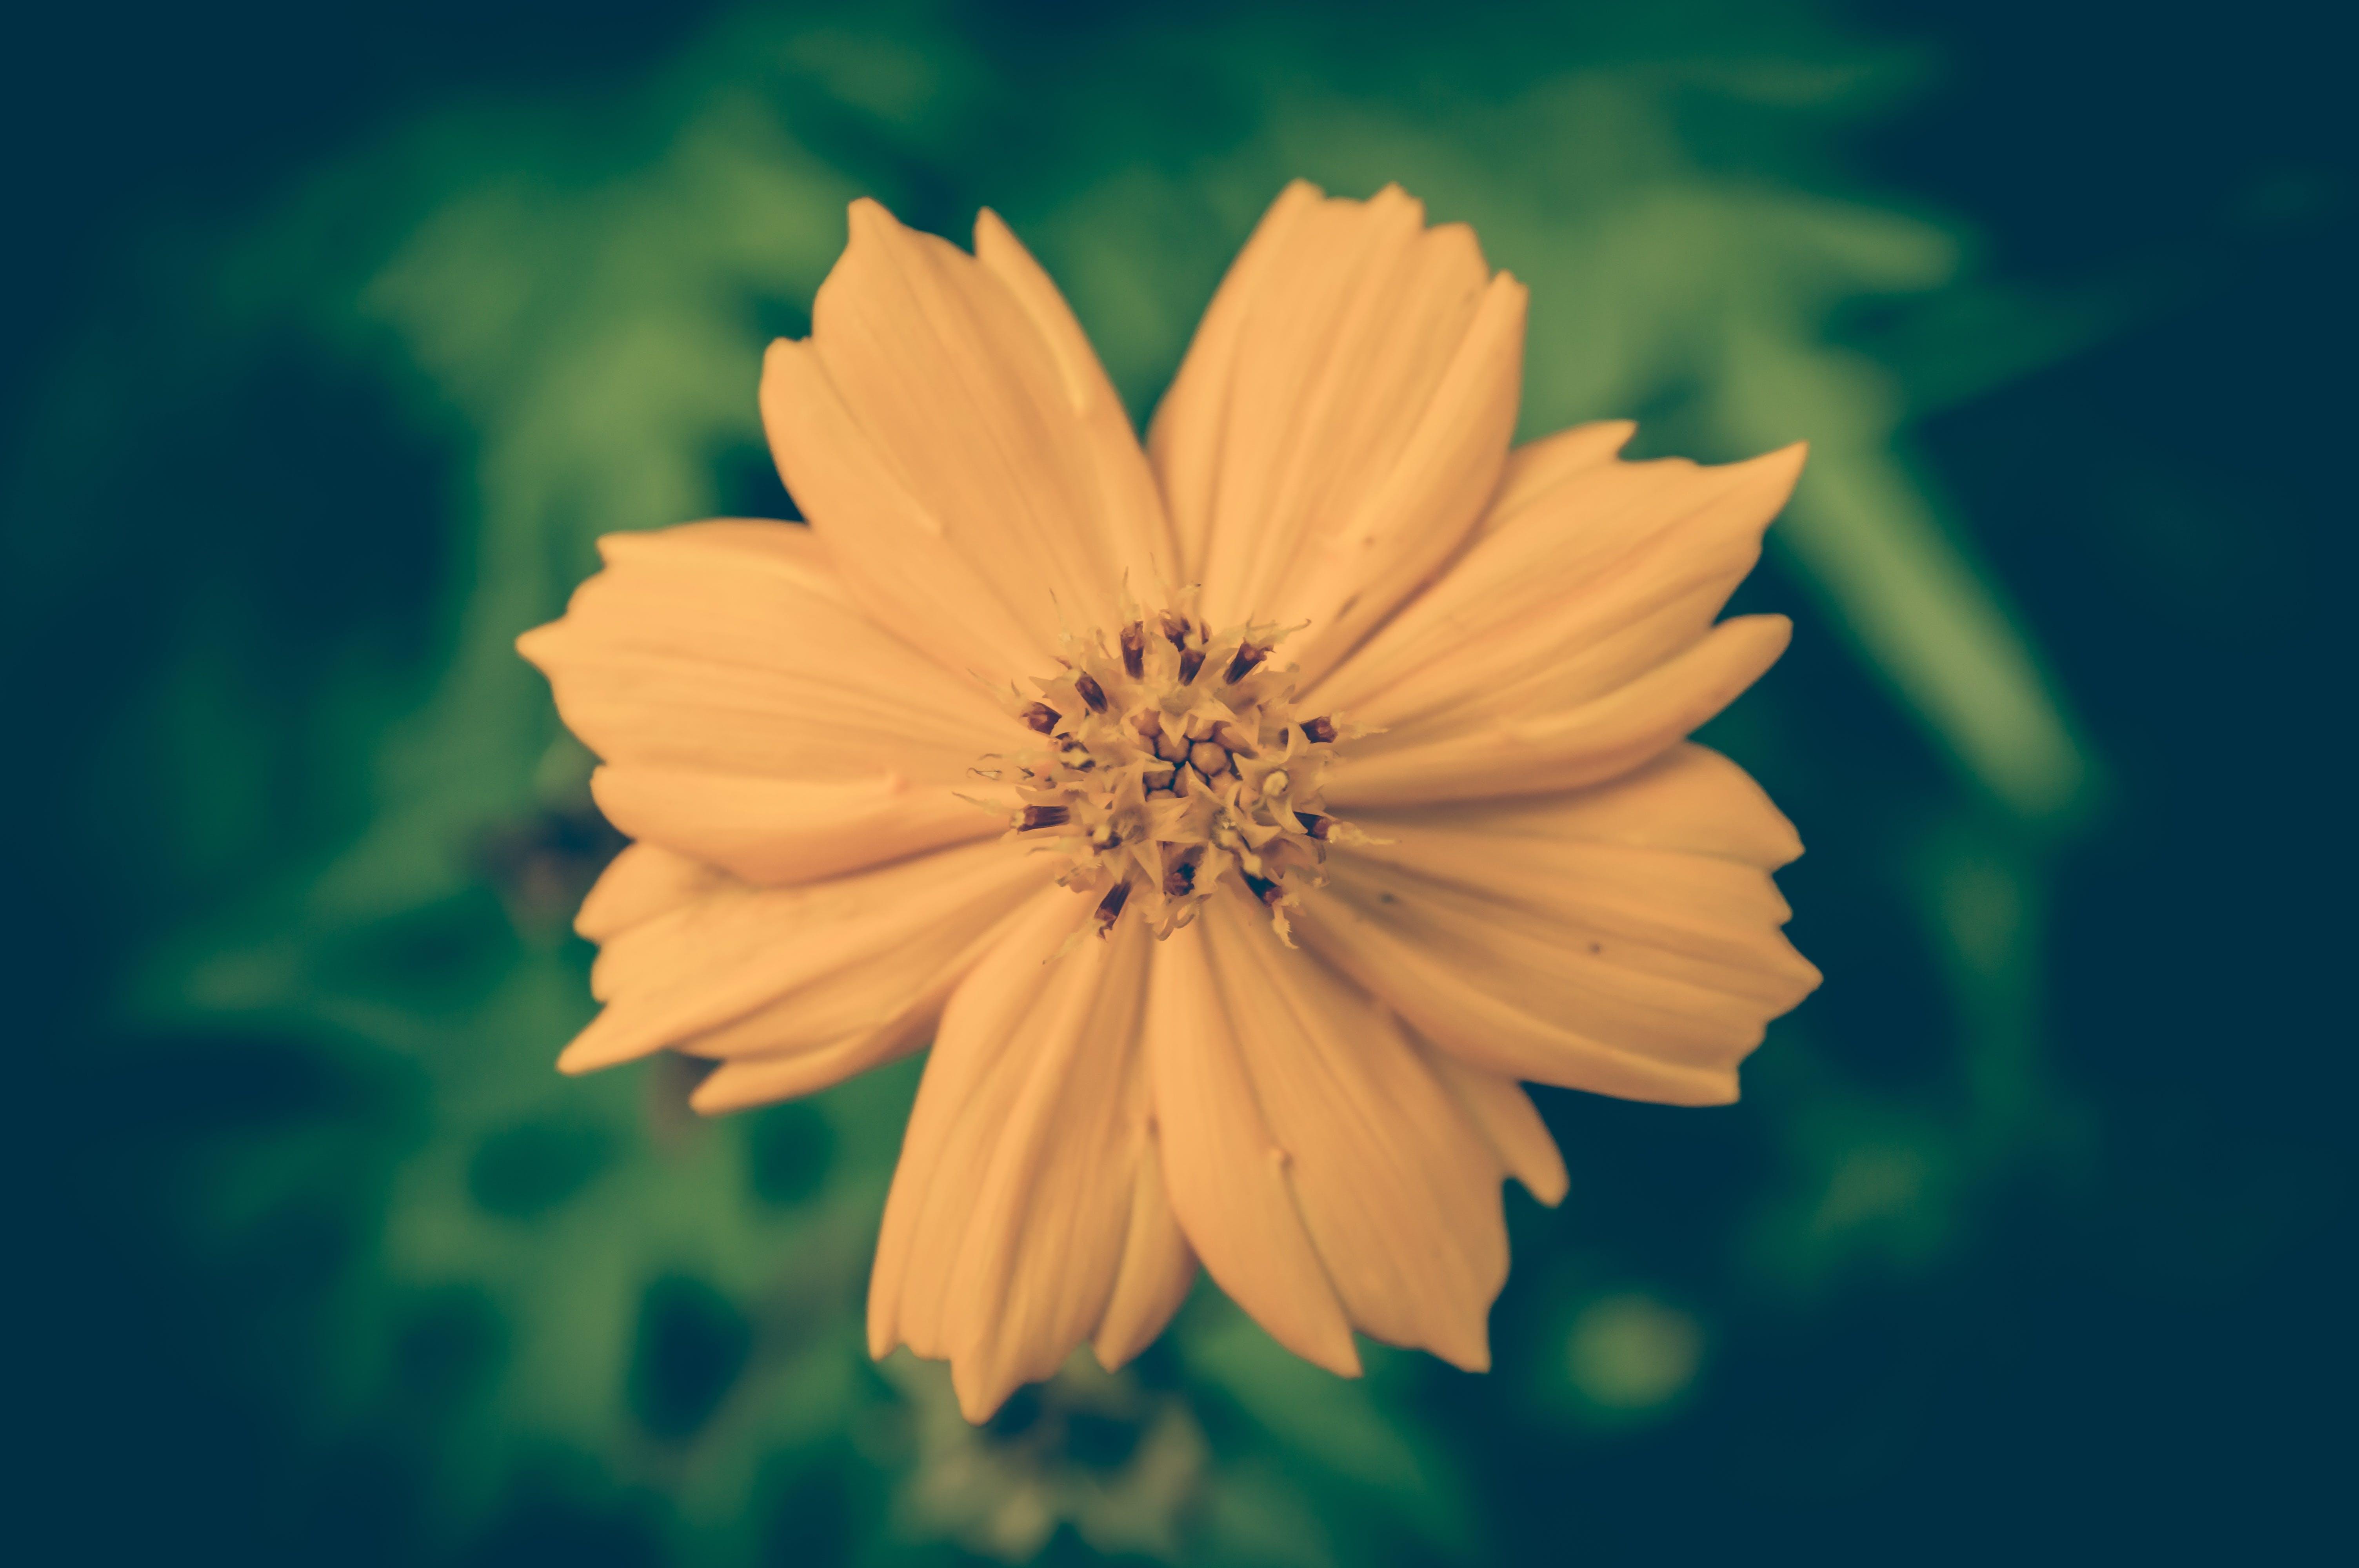 art, beautiful, bloom